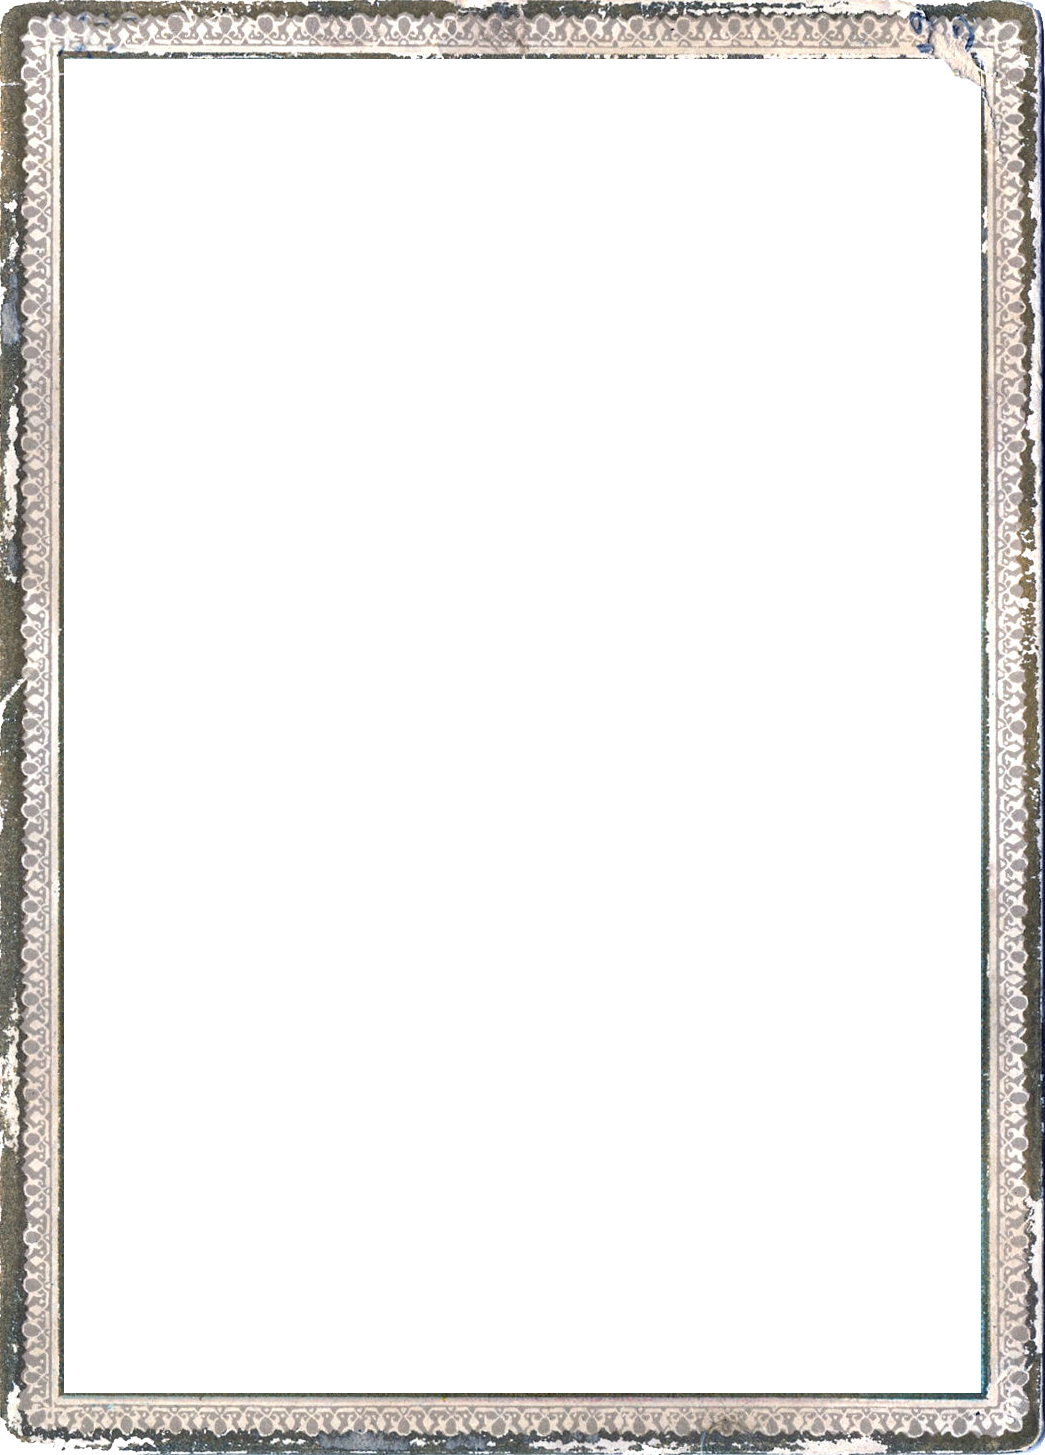 Photo Frames Png File Page 6 Frame Design Amp Reviews